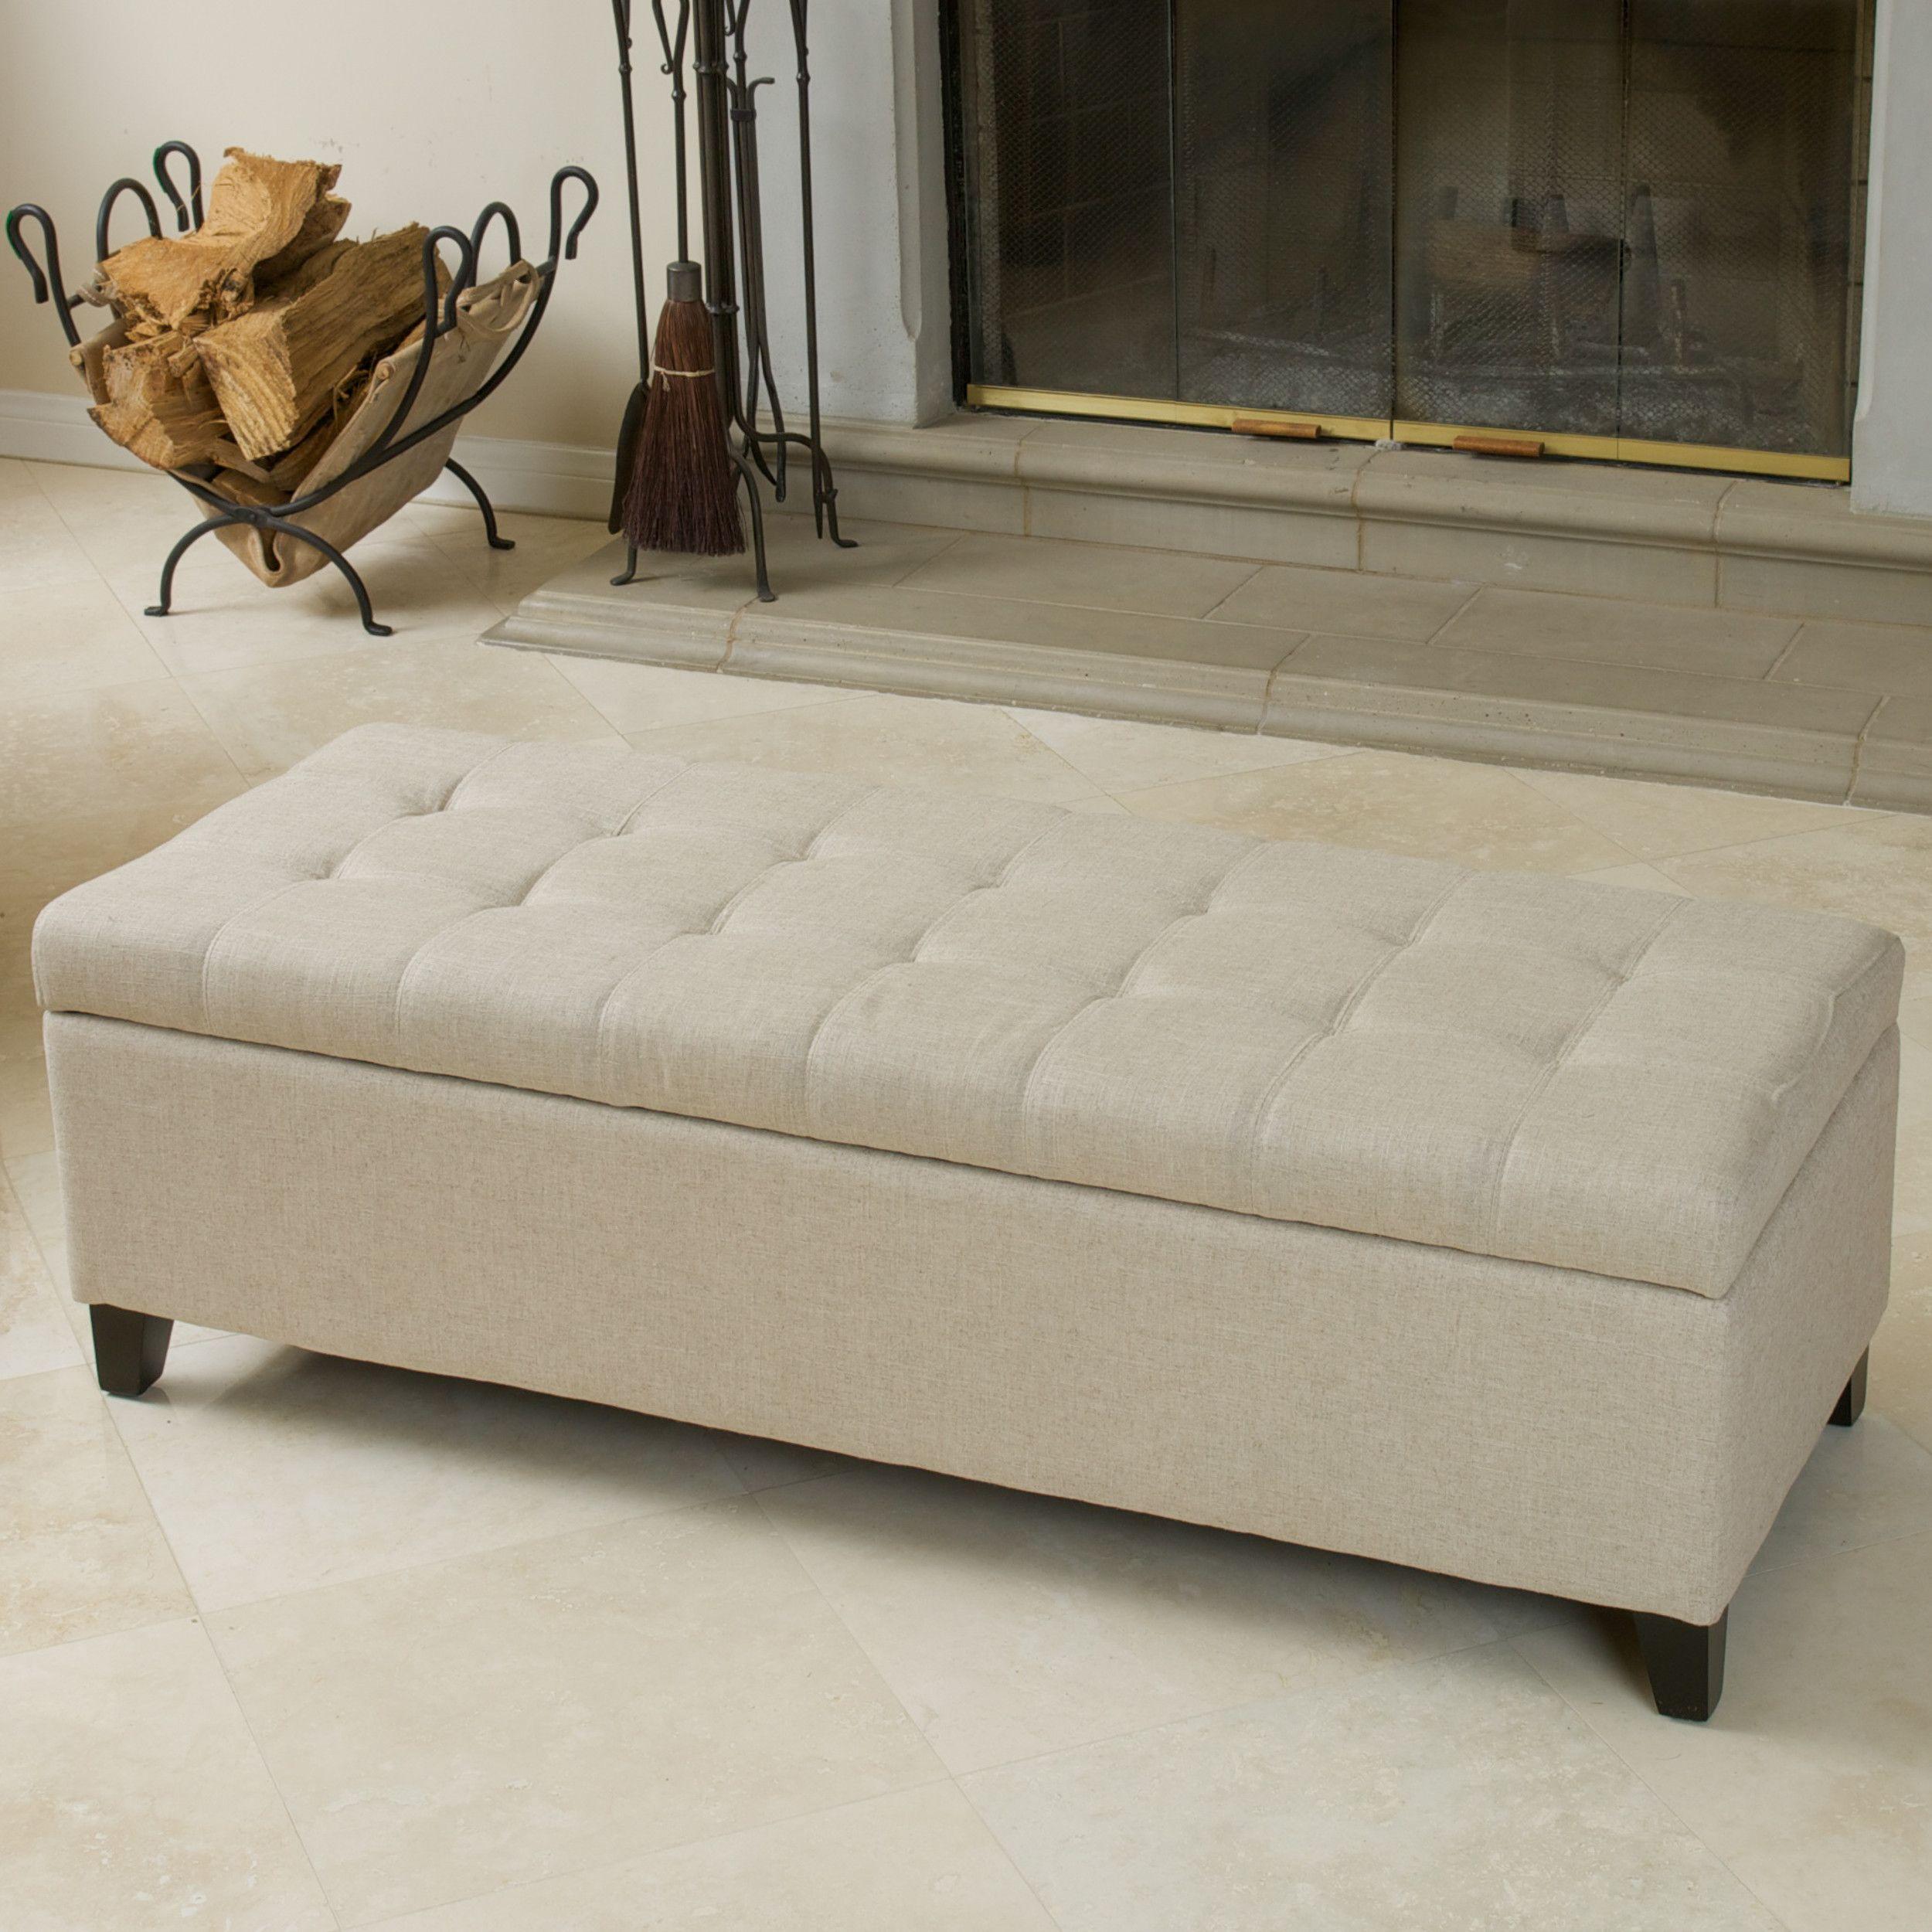 joss&mai n Darby Home Co® Trouffaut Tufted Storage Bench | ottomans ...